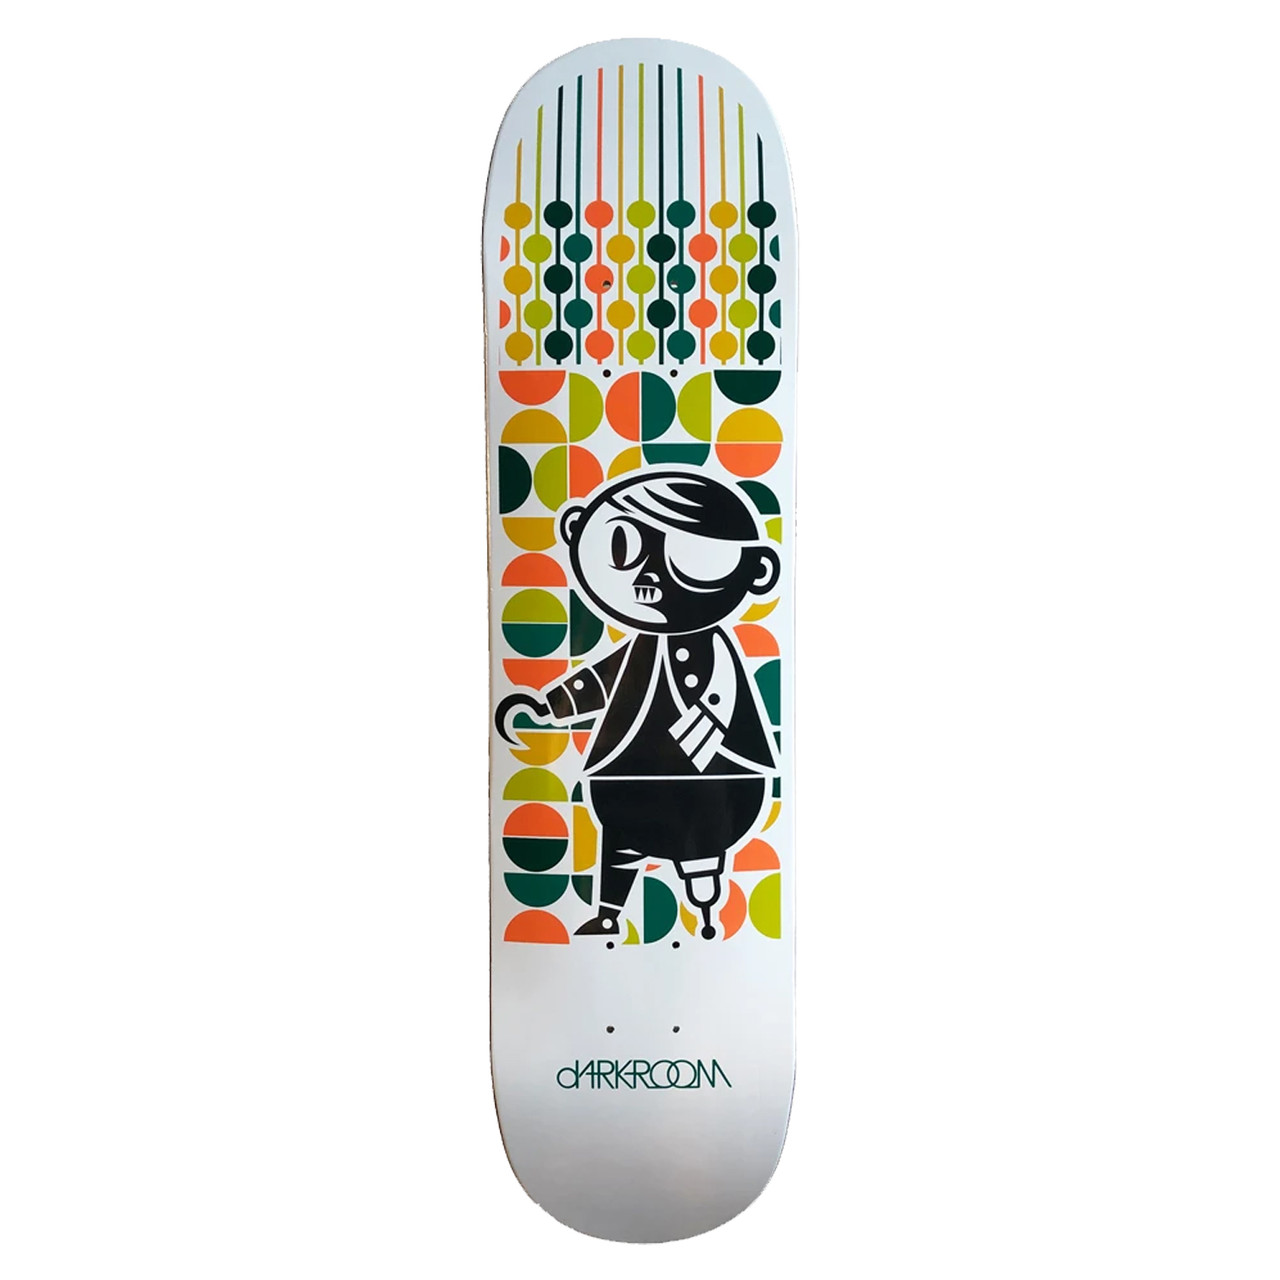 Darkroom Skateboards Deck The Hook 7.75 x 31.5